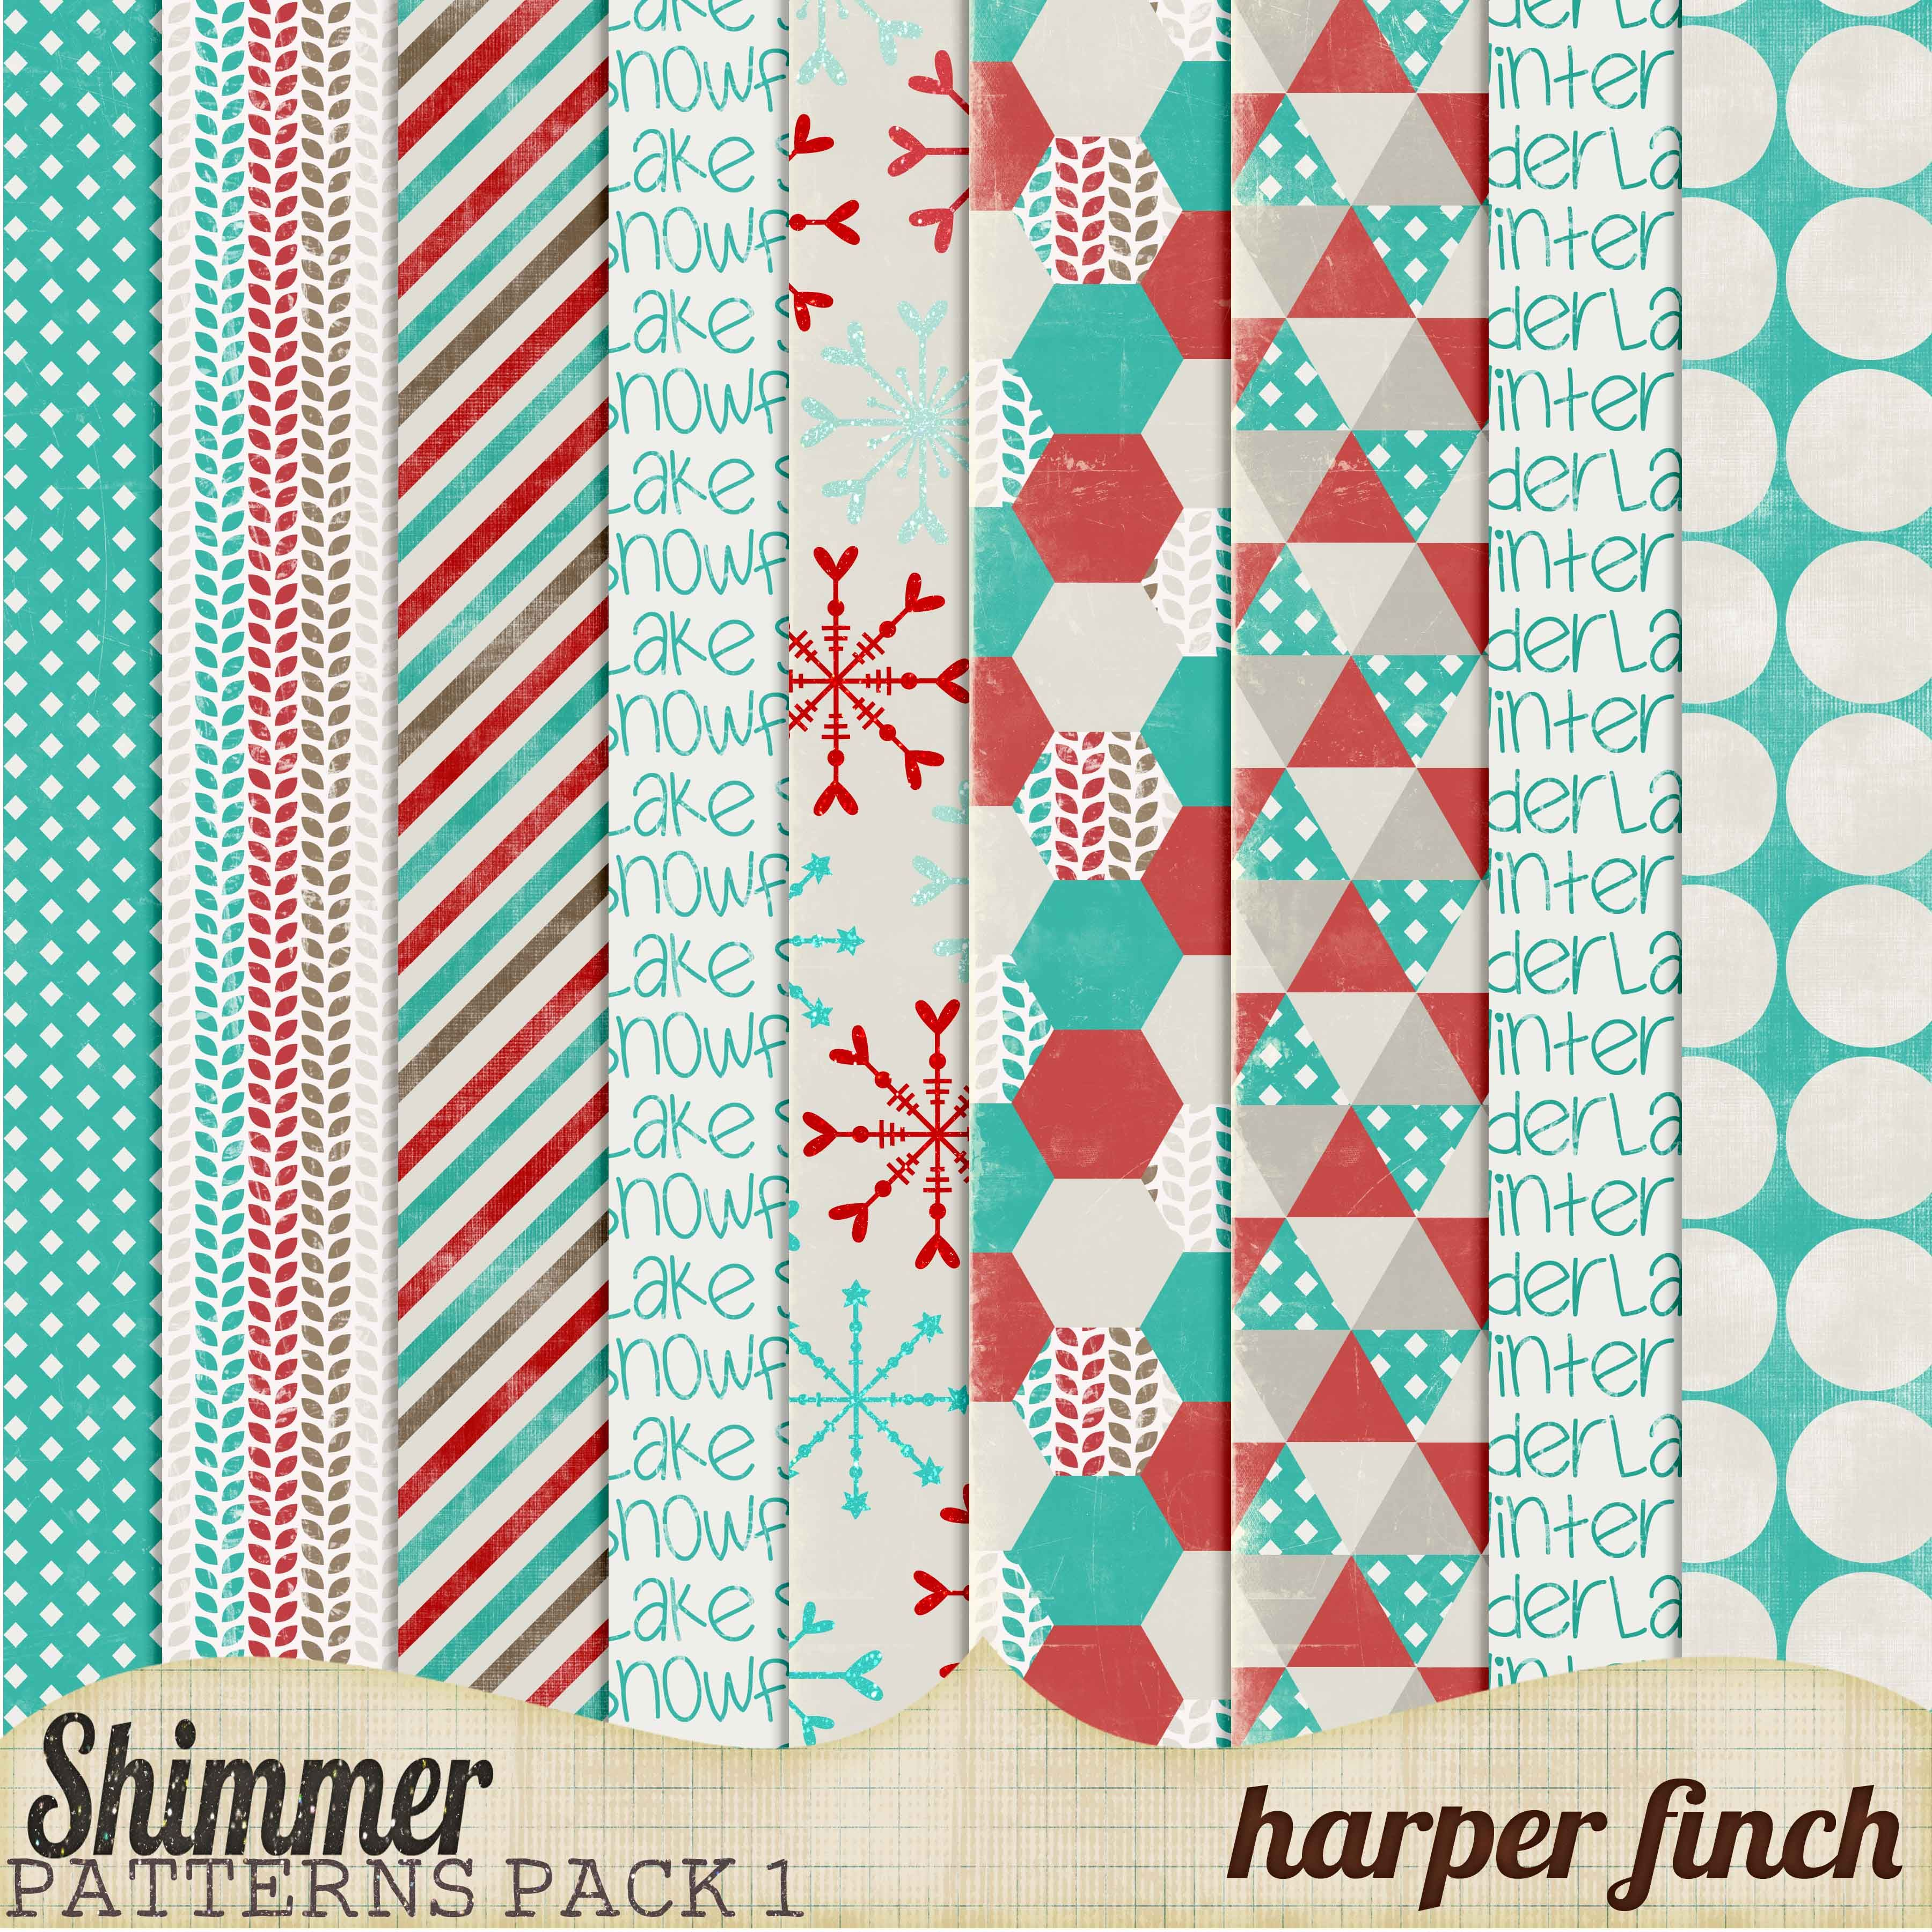 Shimmer, Pattern Paper Pack One by harperfinch.deviantart.com on @DeviantArt